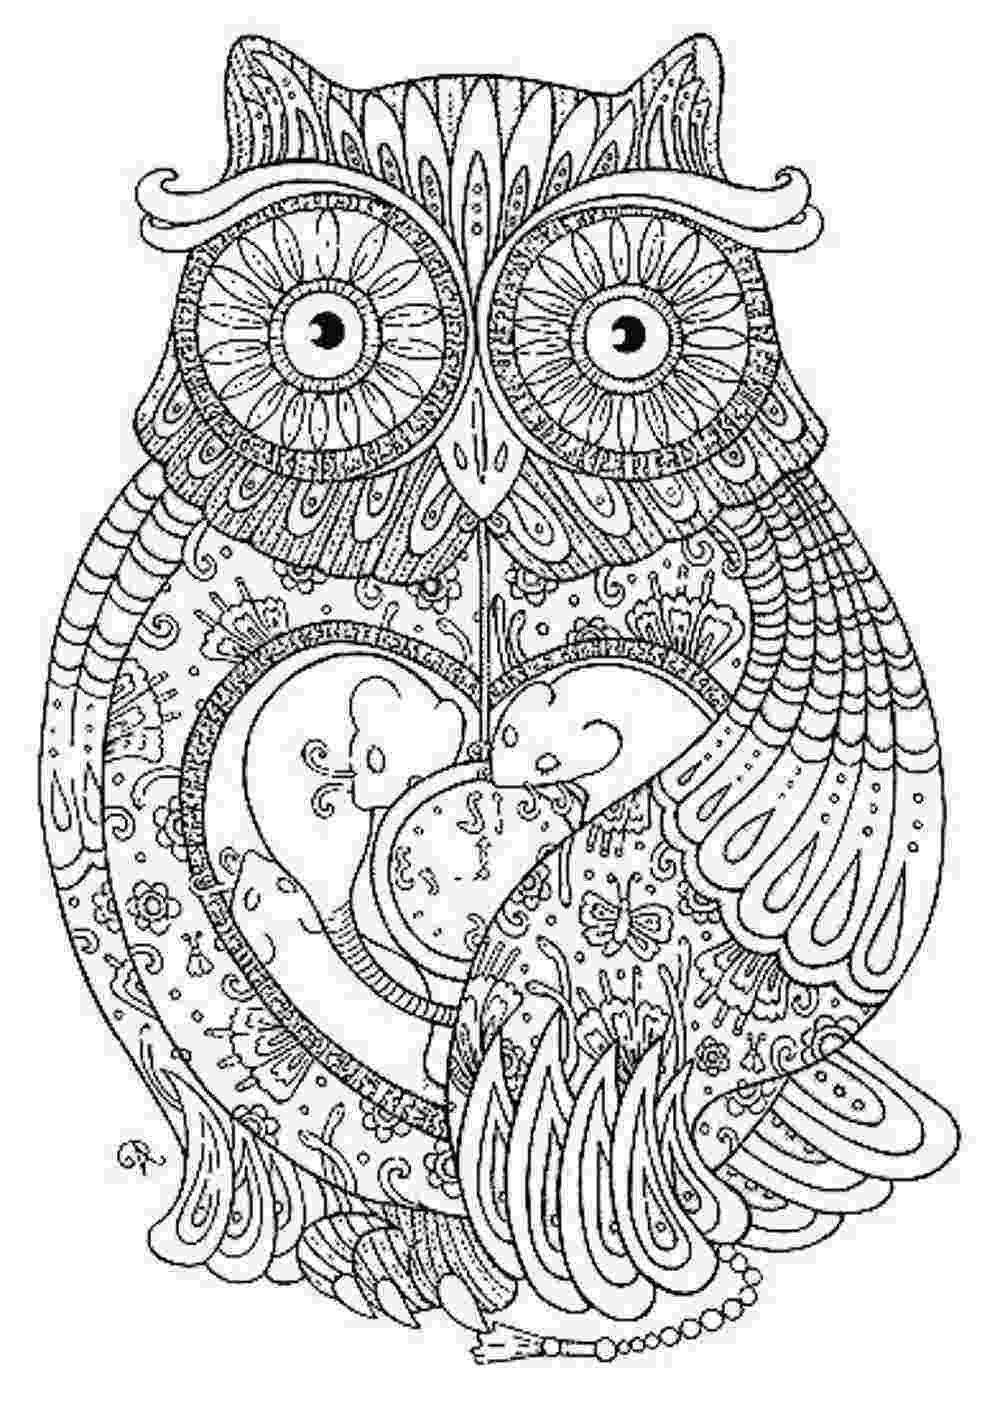 animal coloring pages printable animals coloring pages getcoloringpagescom animal pages coloring printable